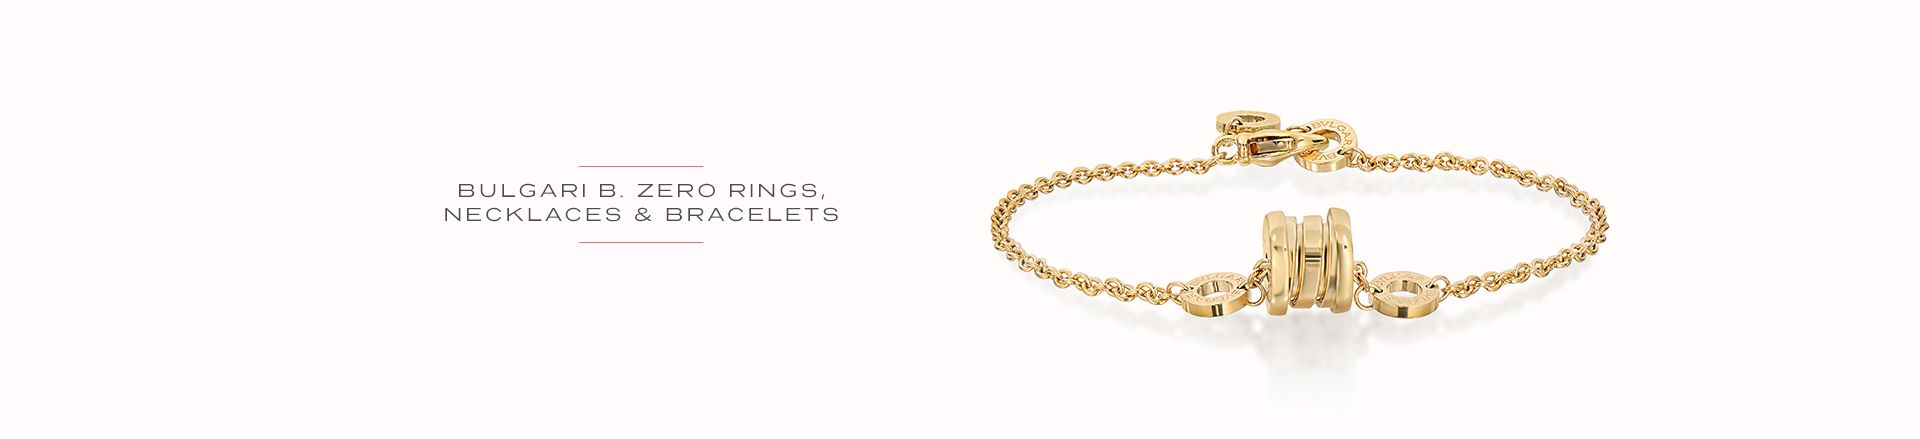 Bulgari B.Zero Rings and Necklaces